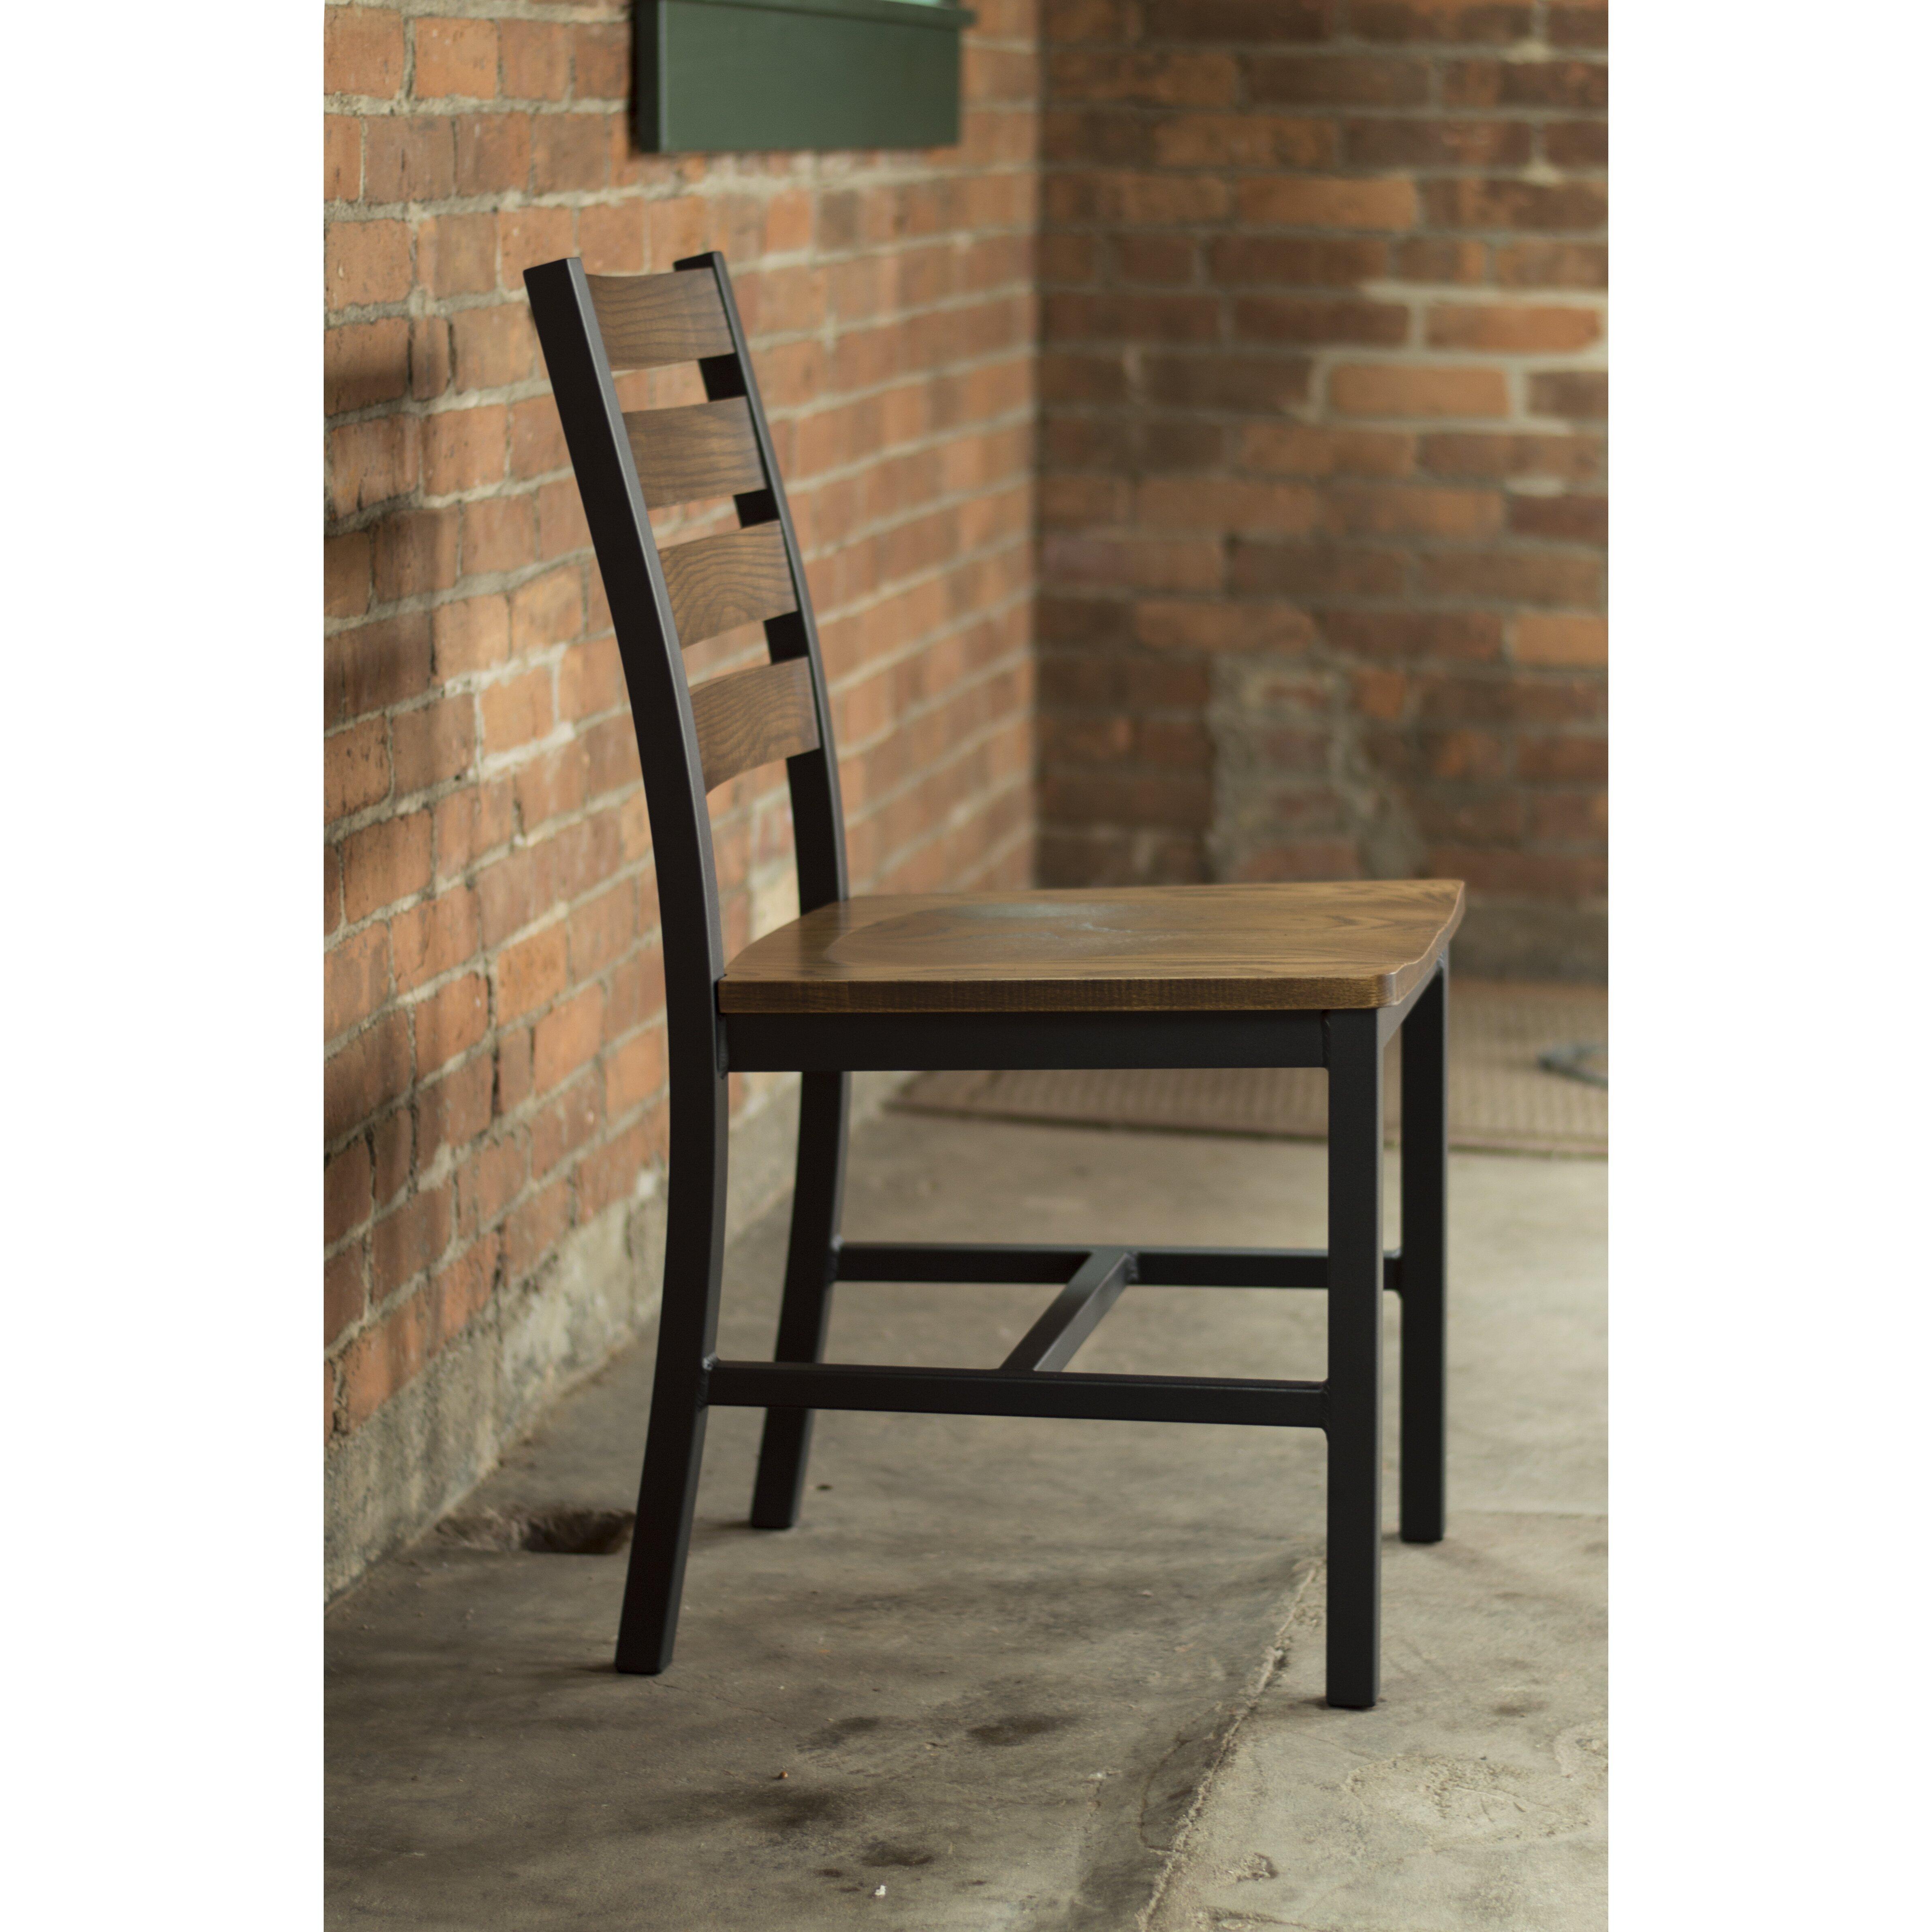 elan furniture loft side chair  reviews  wayfair - elan furniture loft side chair